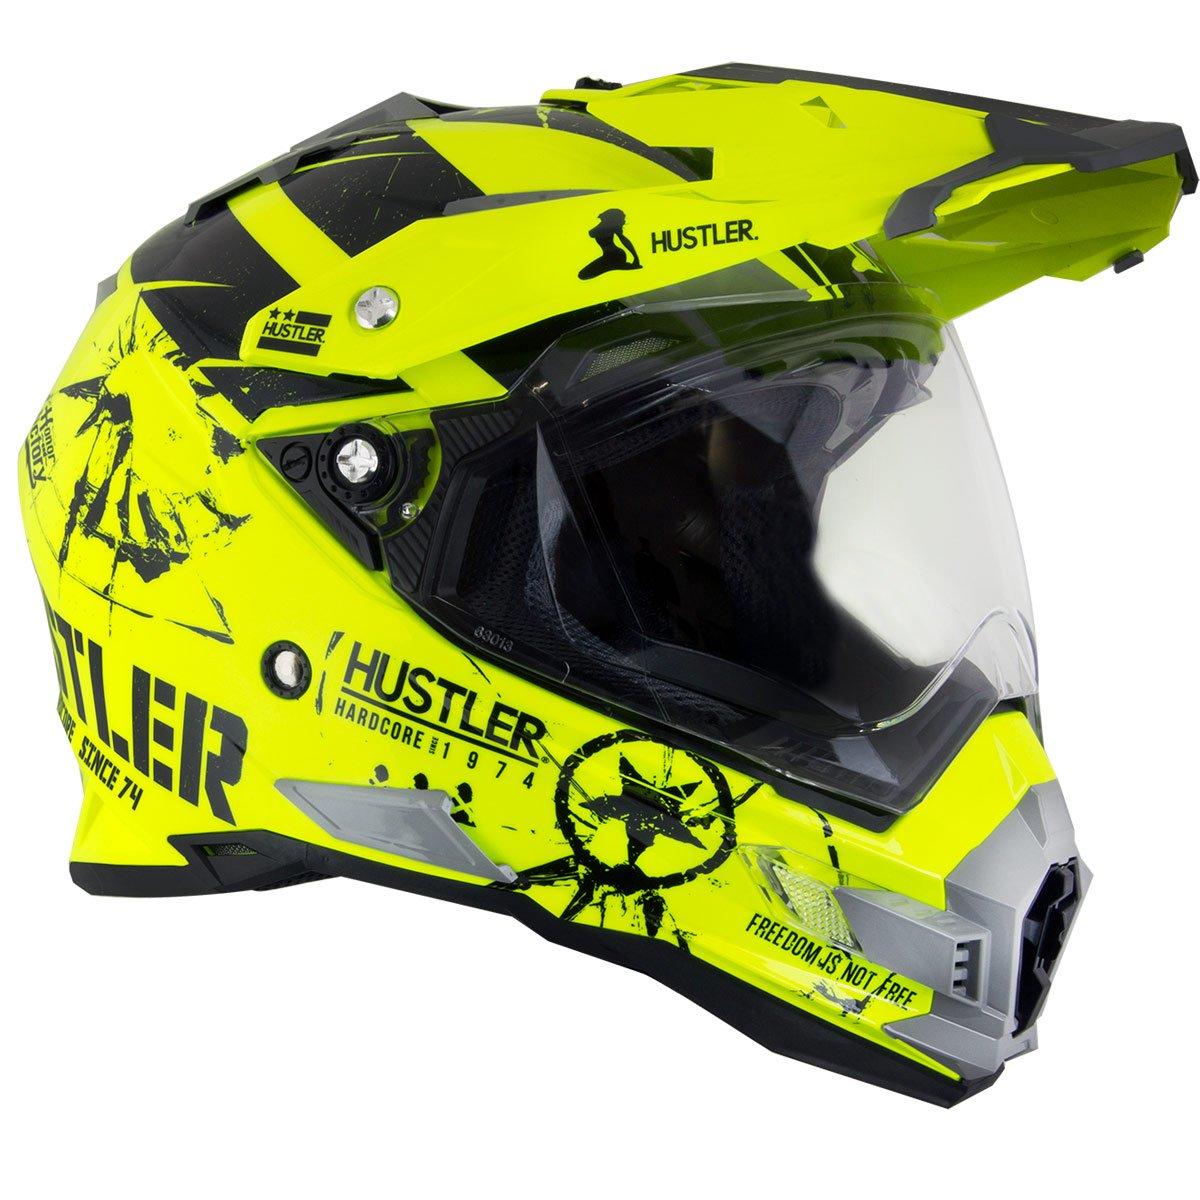 Hustler Hardcore Since 1974 Dual Sport High-Viz Neon Motorcycle Helmet - X-Large